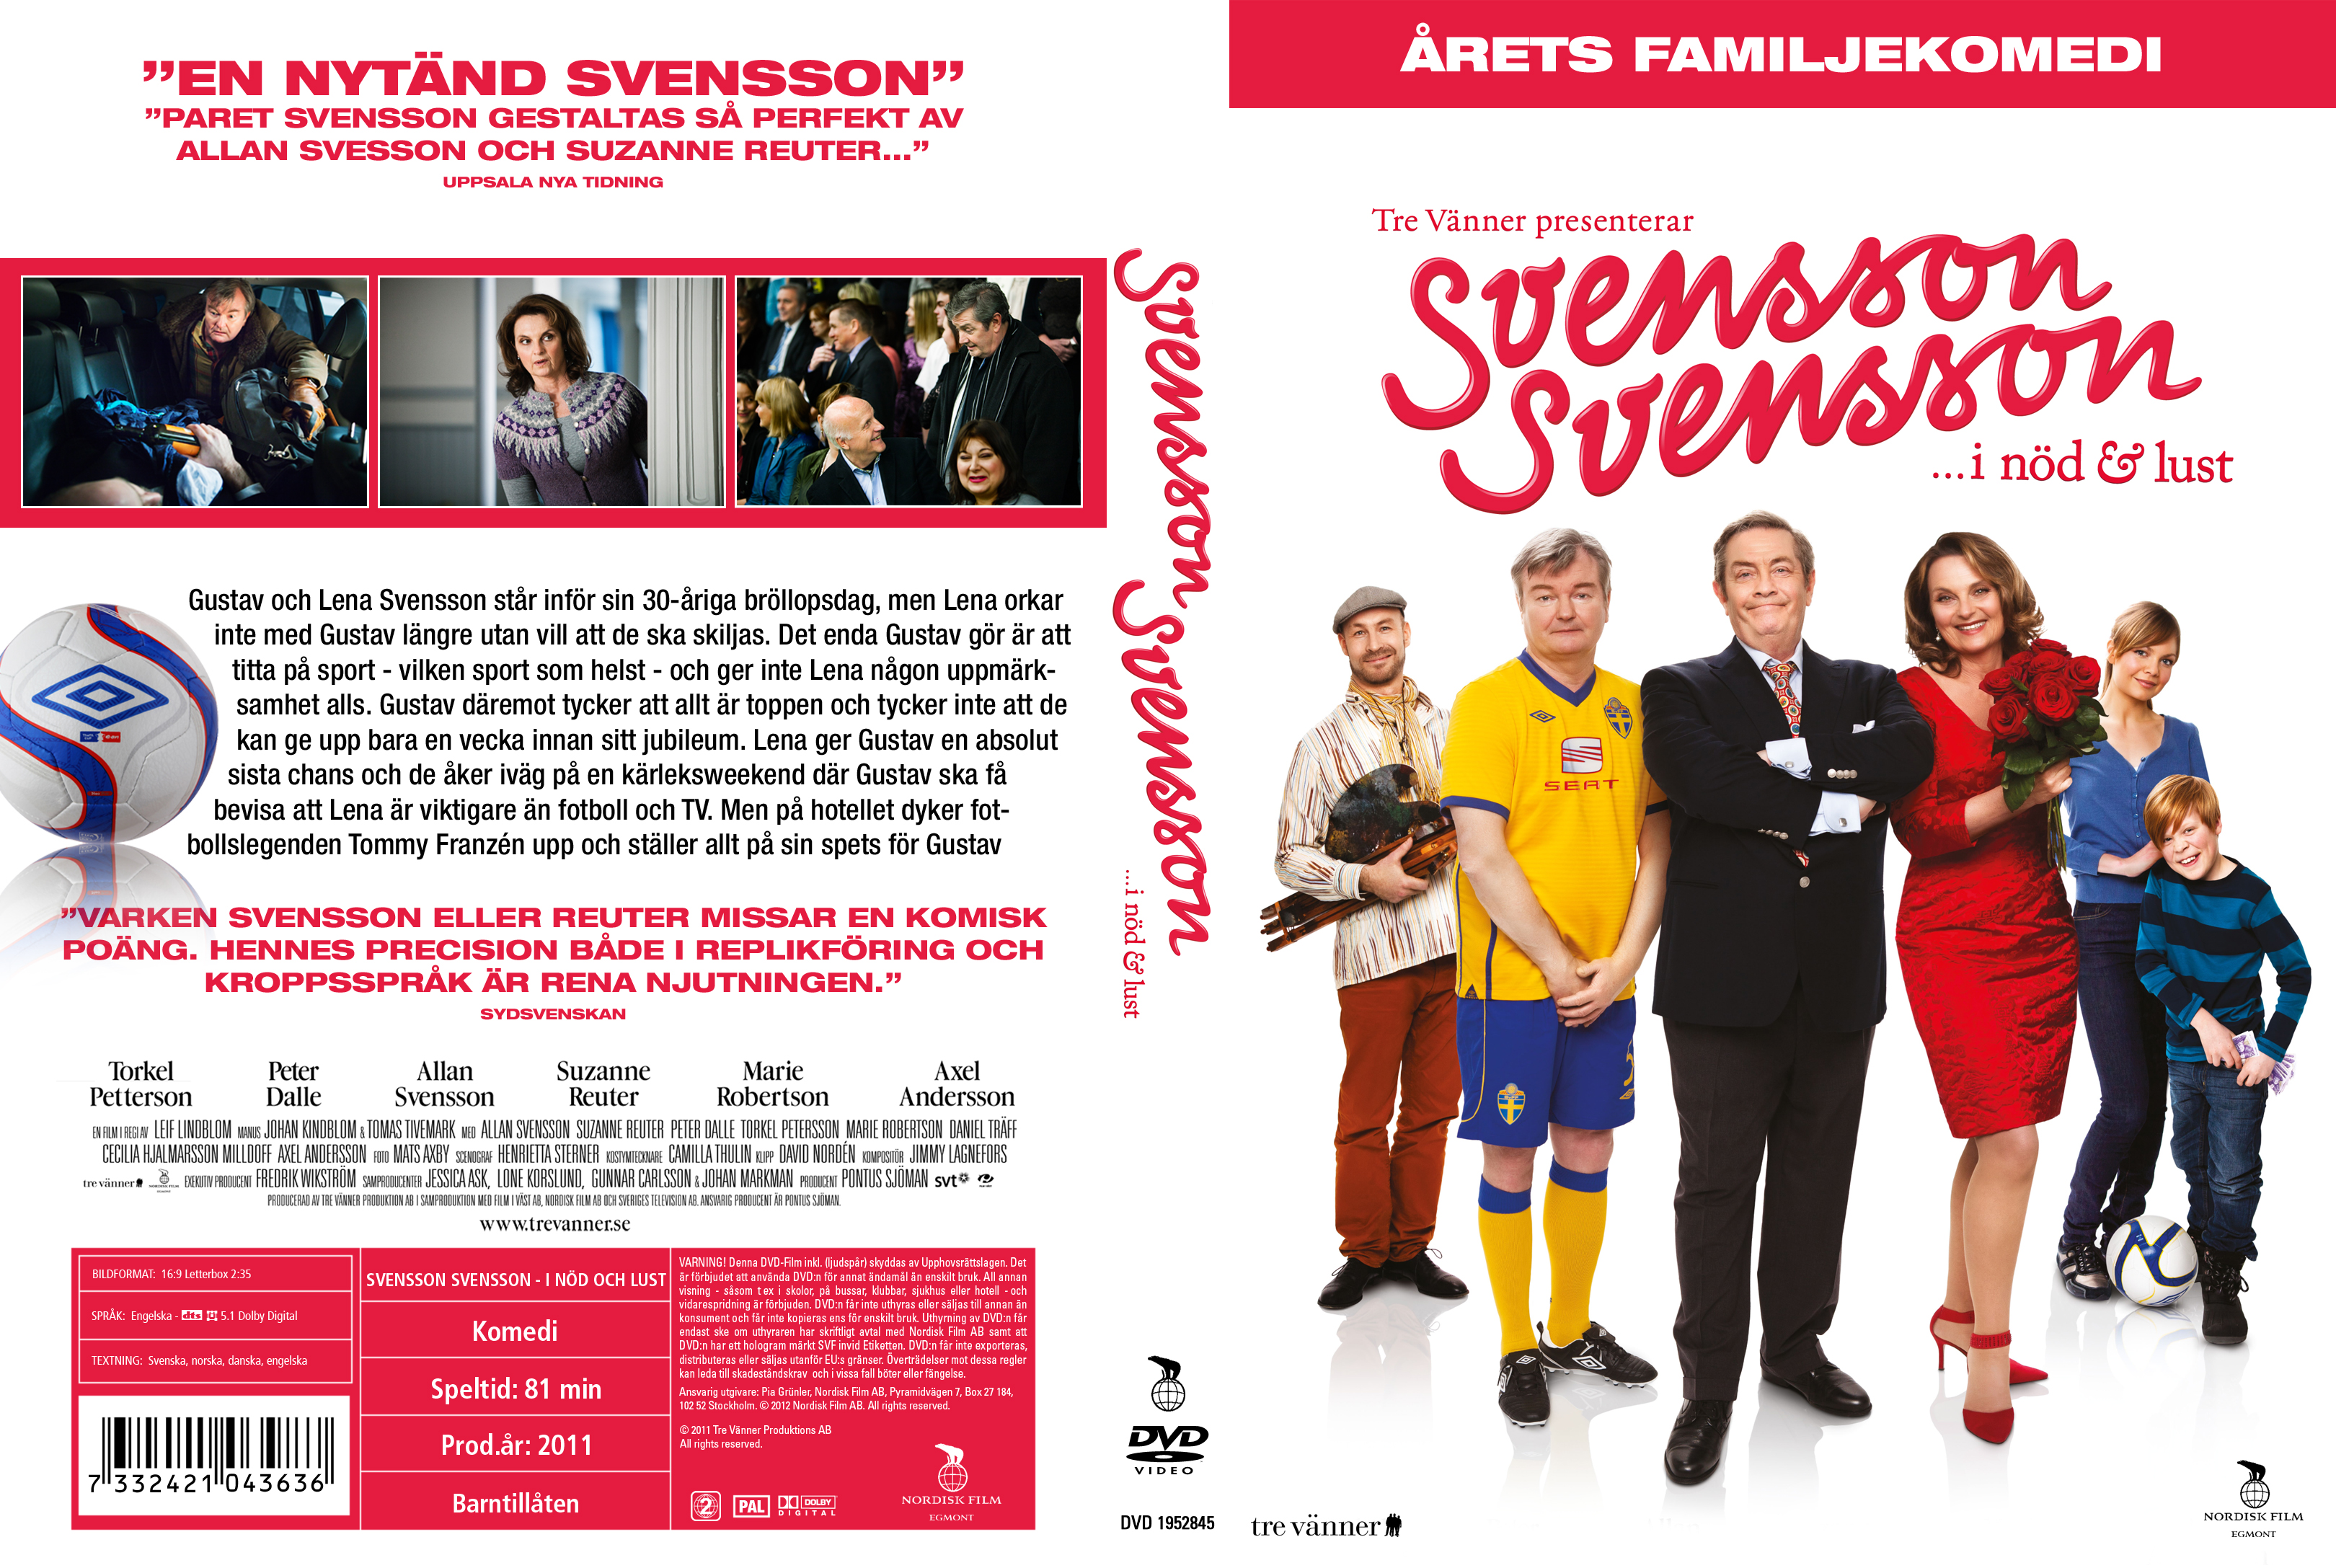 Svensson dvd covers.box.sk ::: i n d & lust - high quality